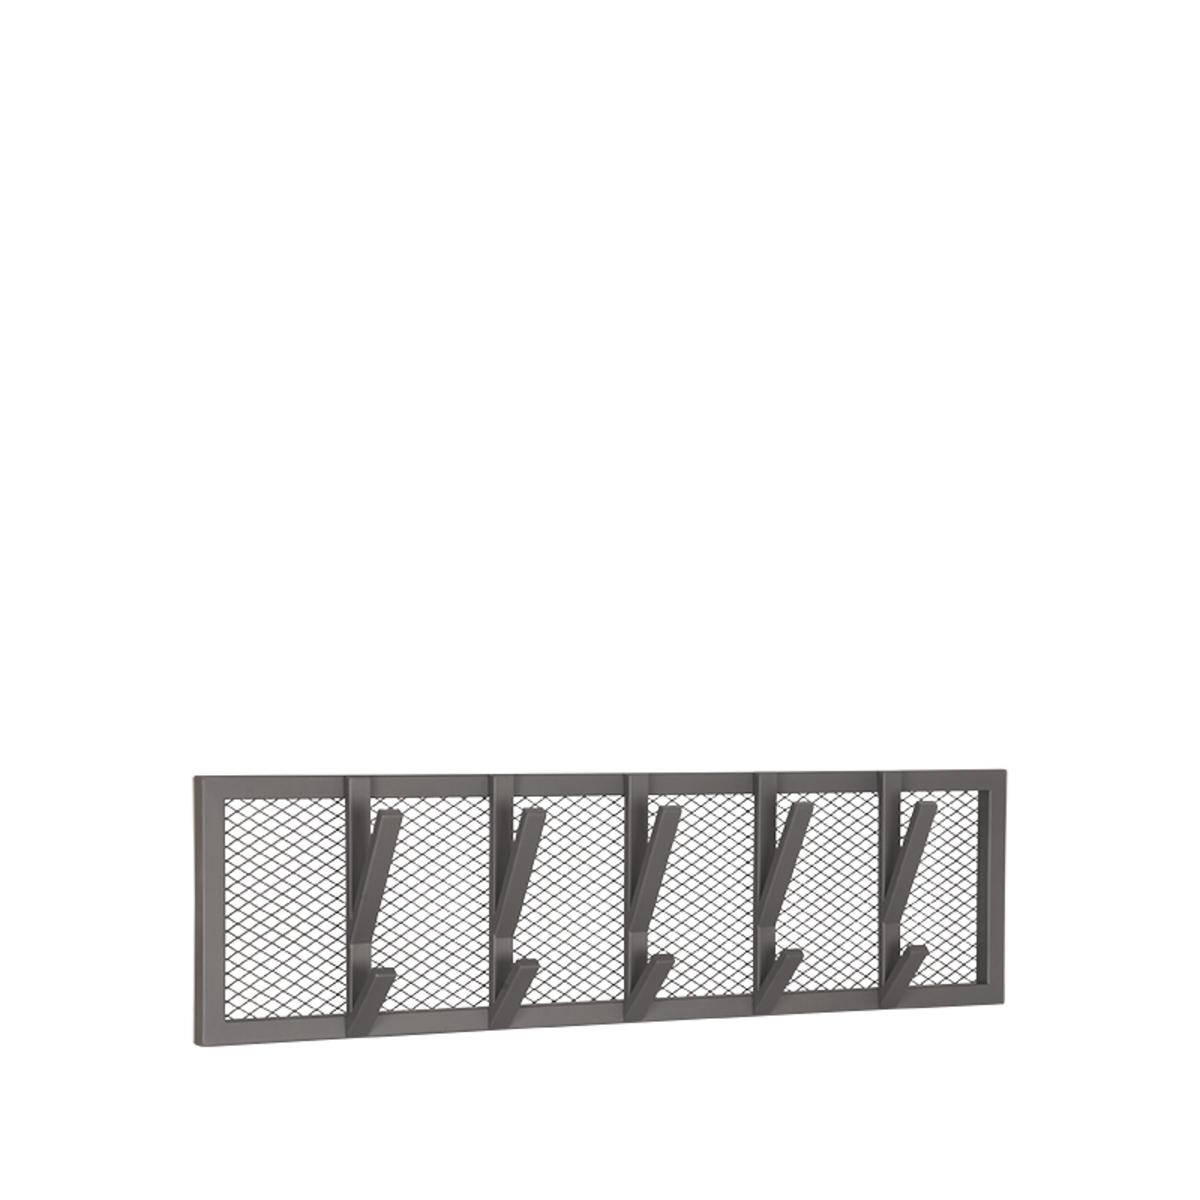 LABEL51 Kapstok Gruff - Burned Steel - Metaal - L